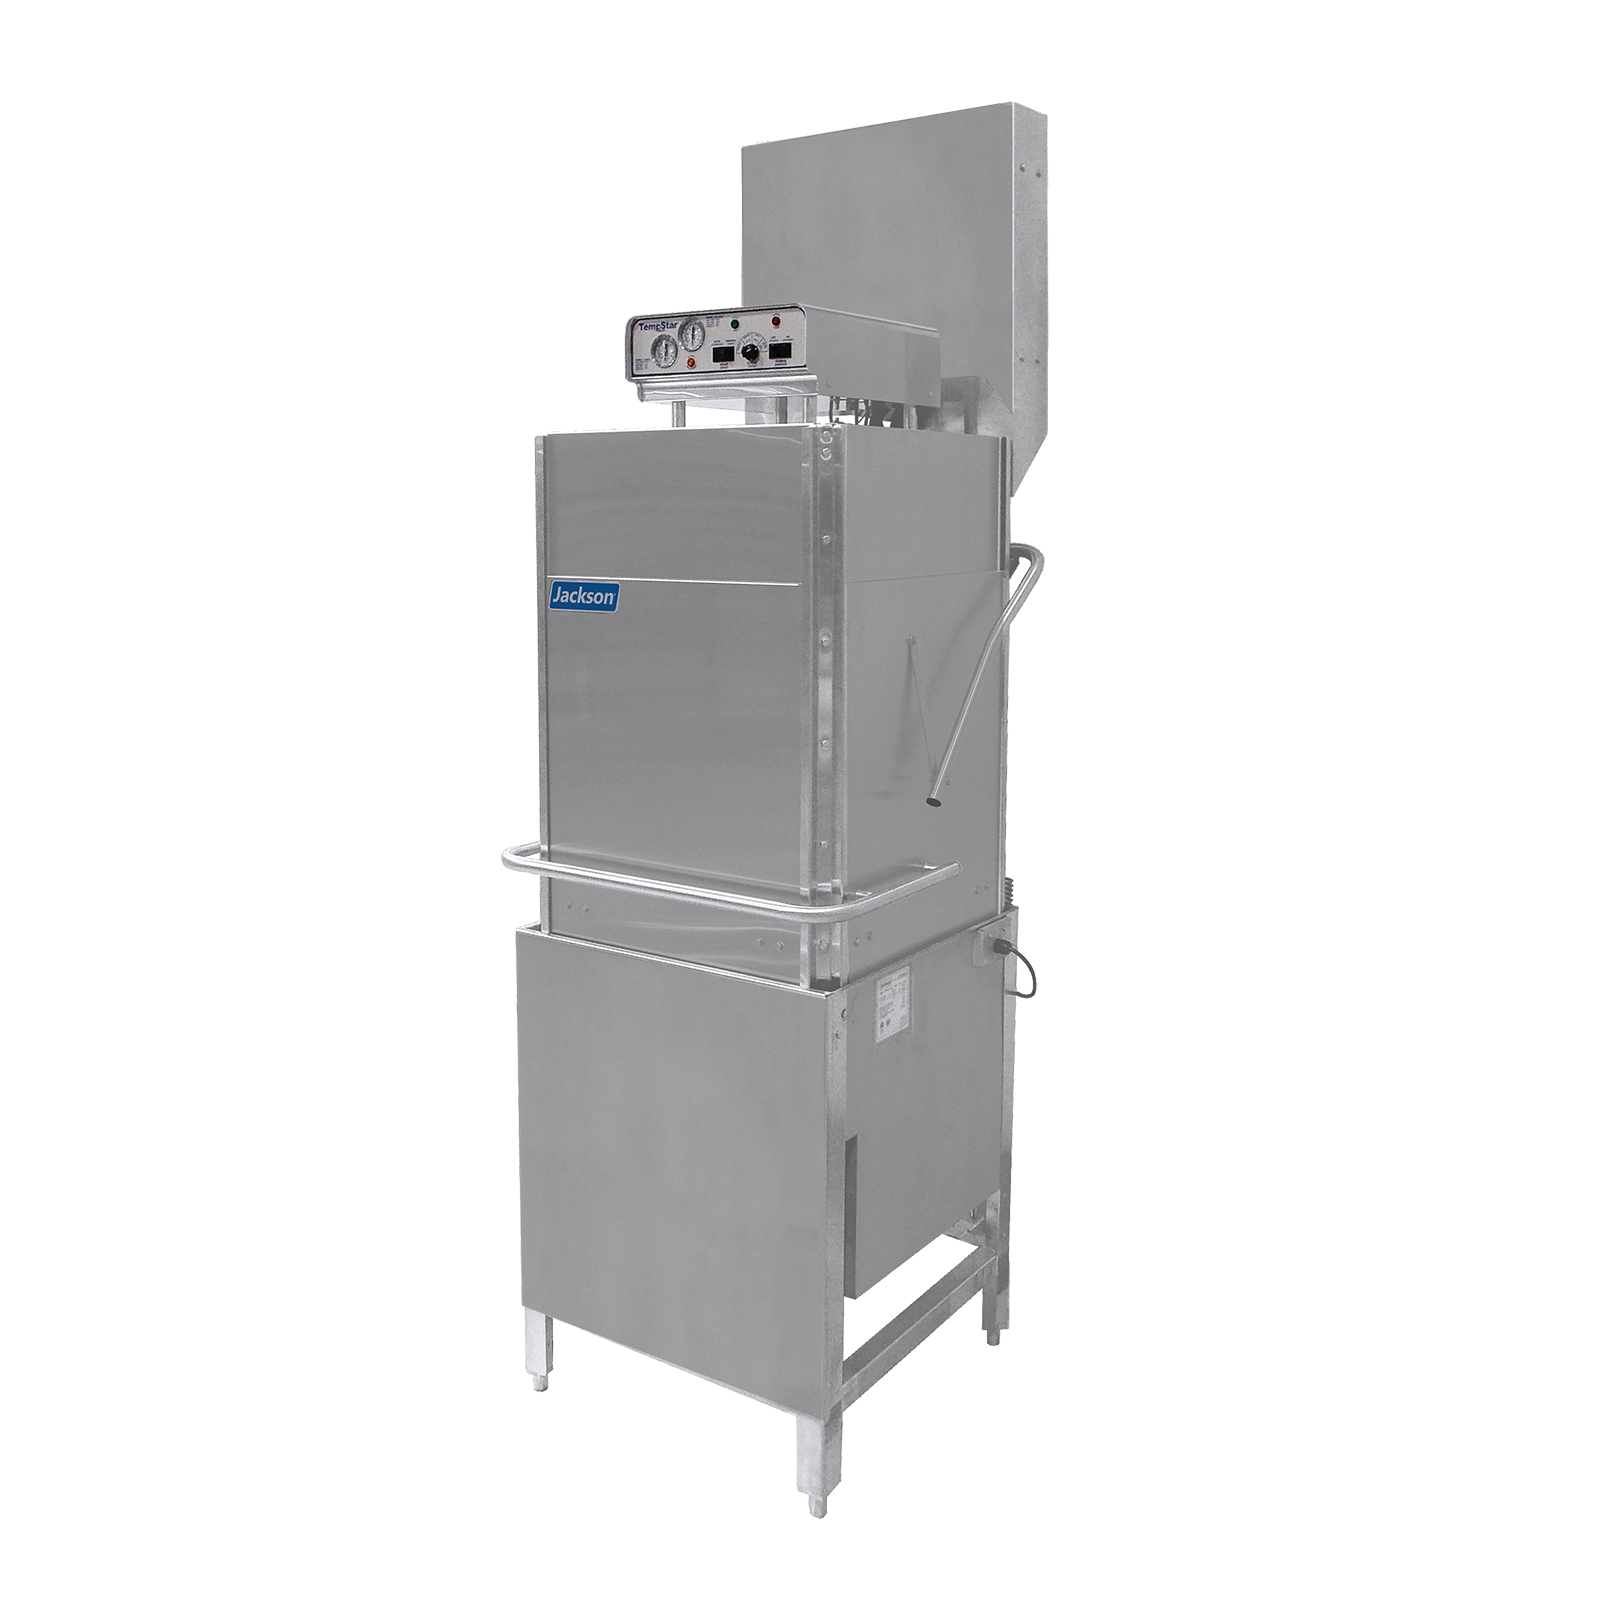 Jackson TEMPSTAR HH VENTLESS - TempStar Dishwasher, High Hood Door Type